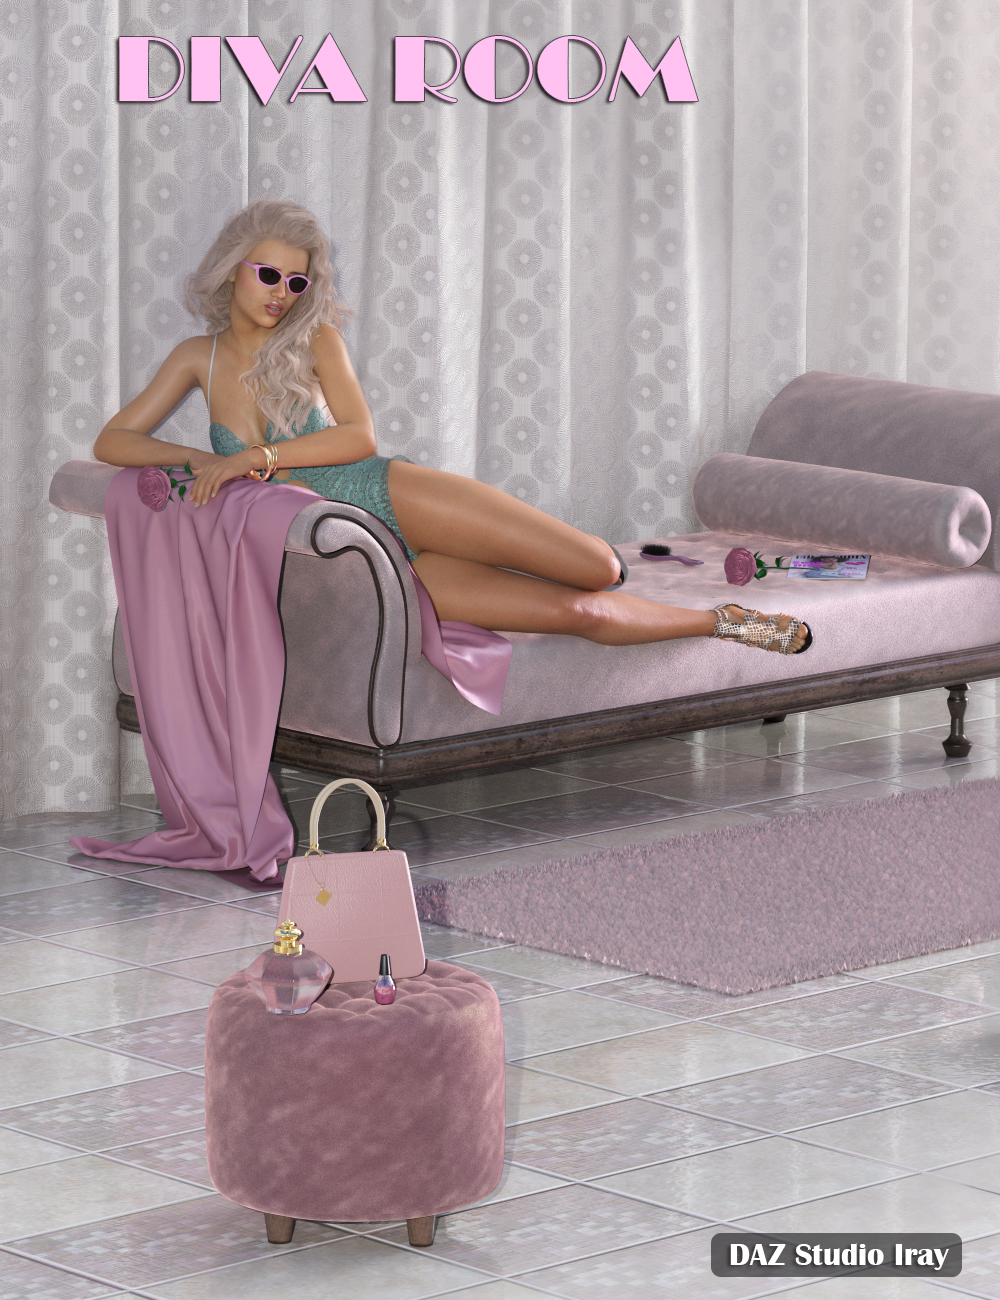 IGDR Diva Room by: i3D_LotusValery3D, 3D Models by Daz 3D